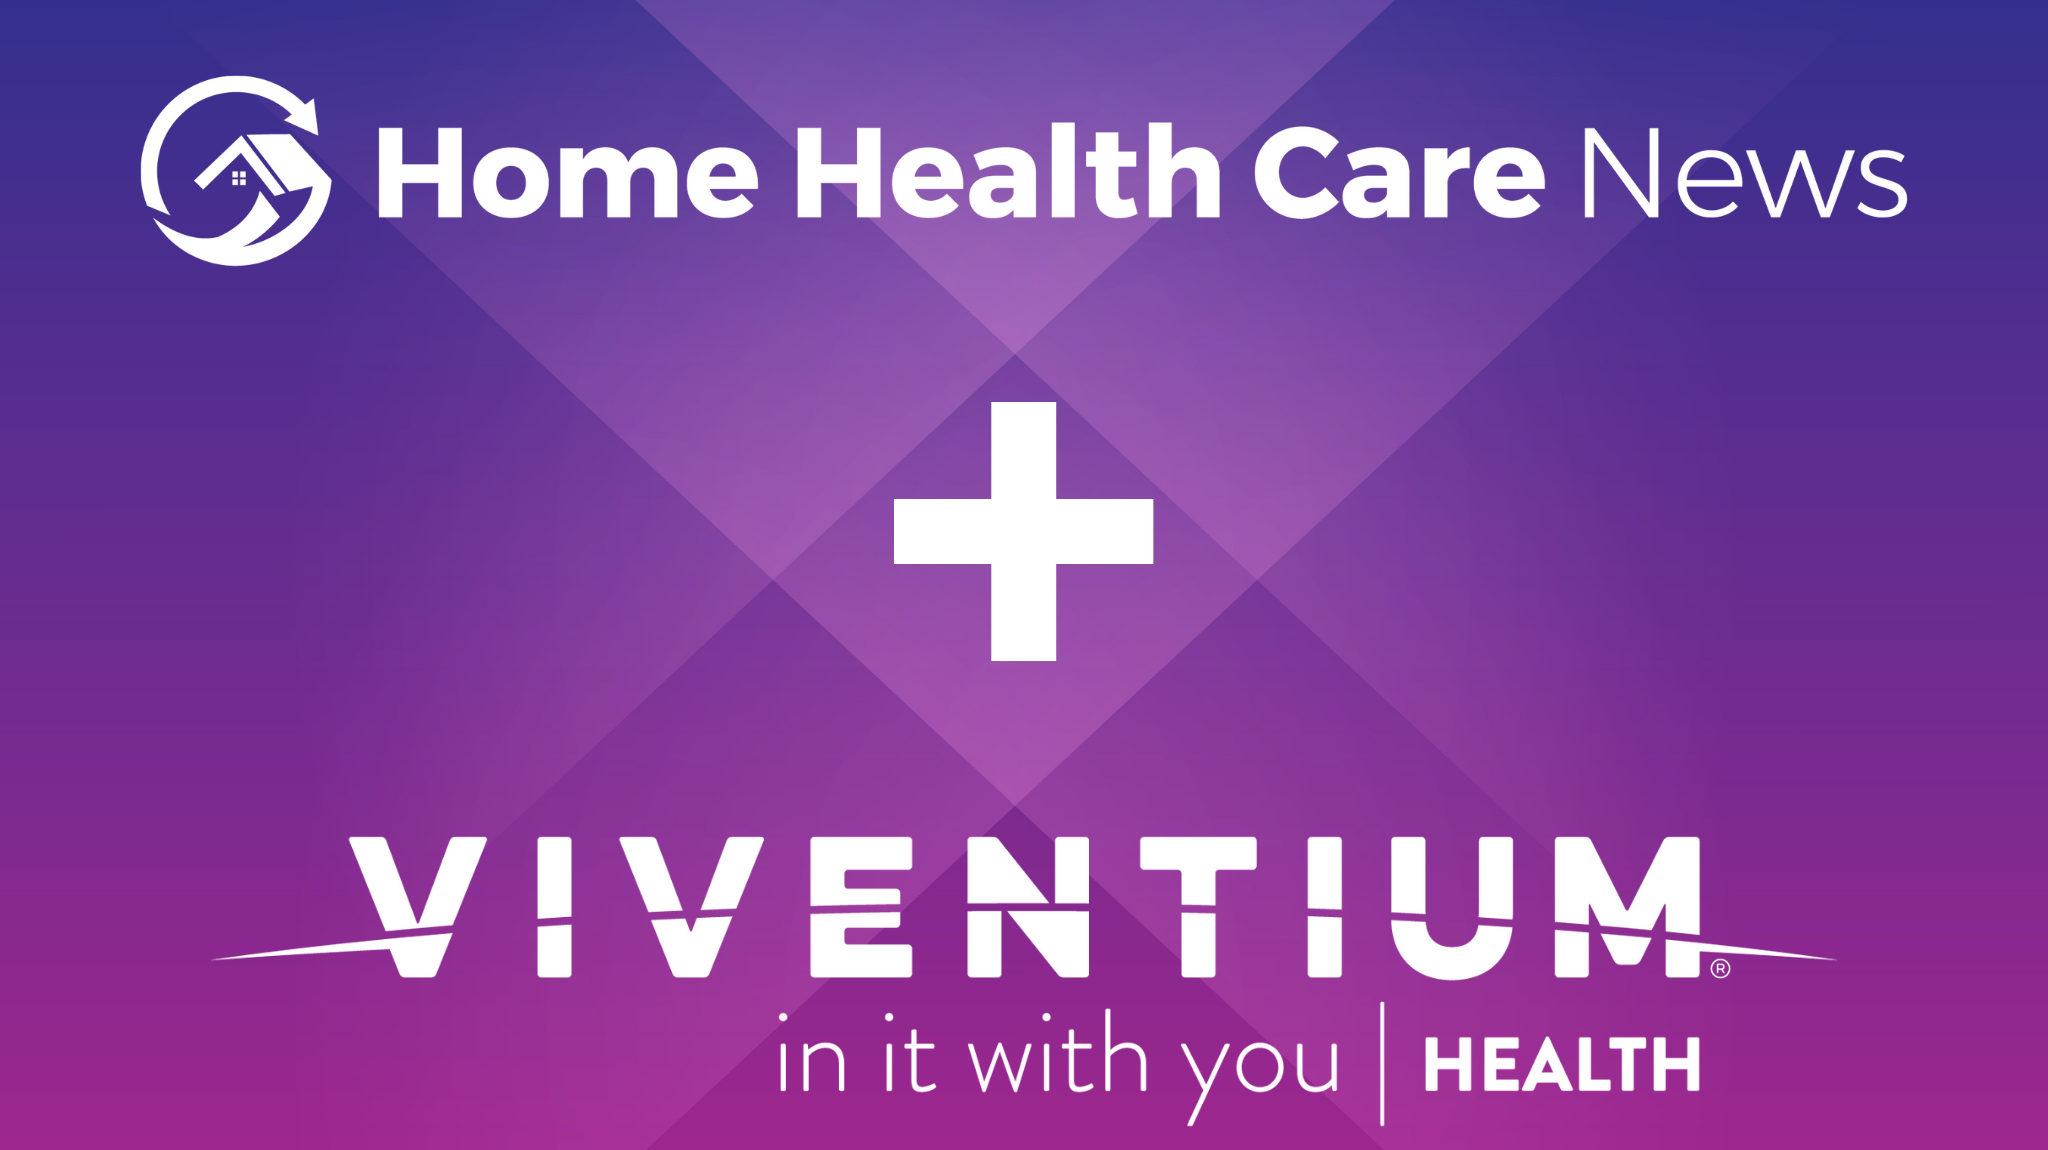 HHCN Viventium Webinar